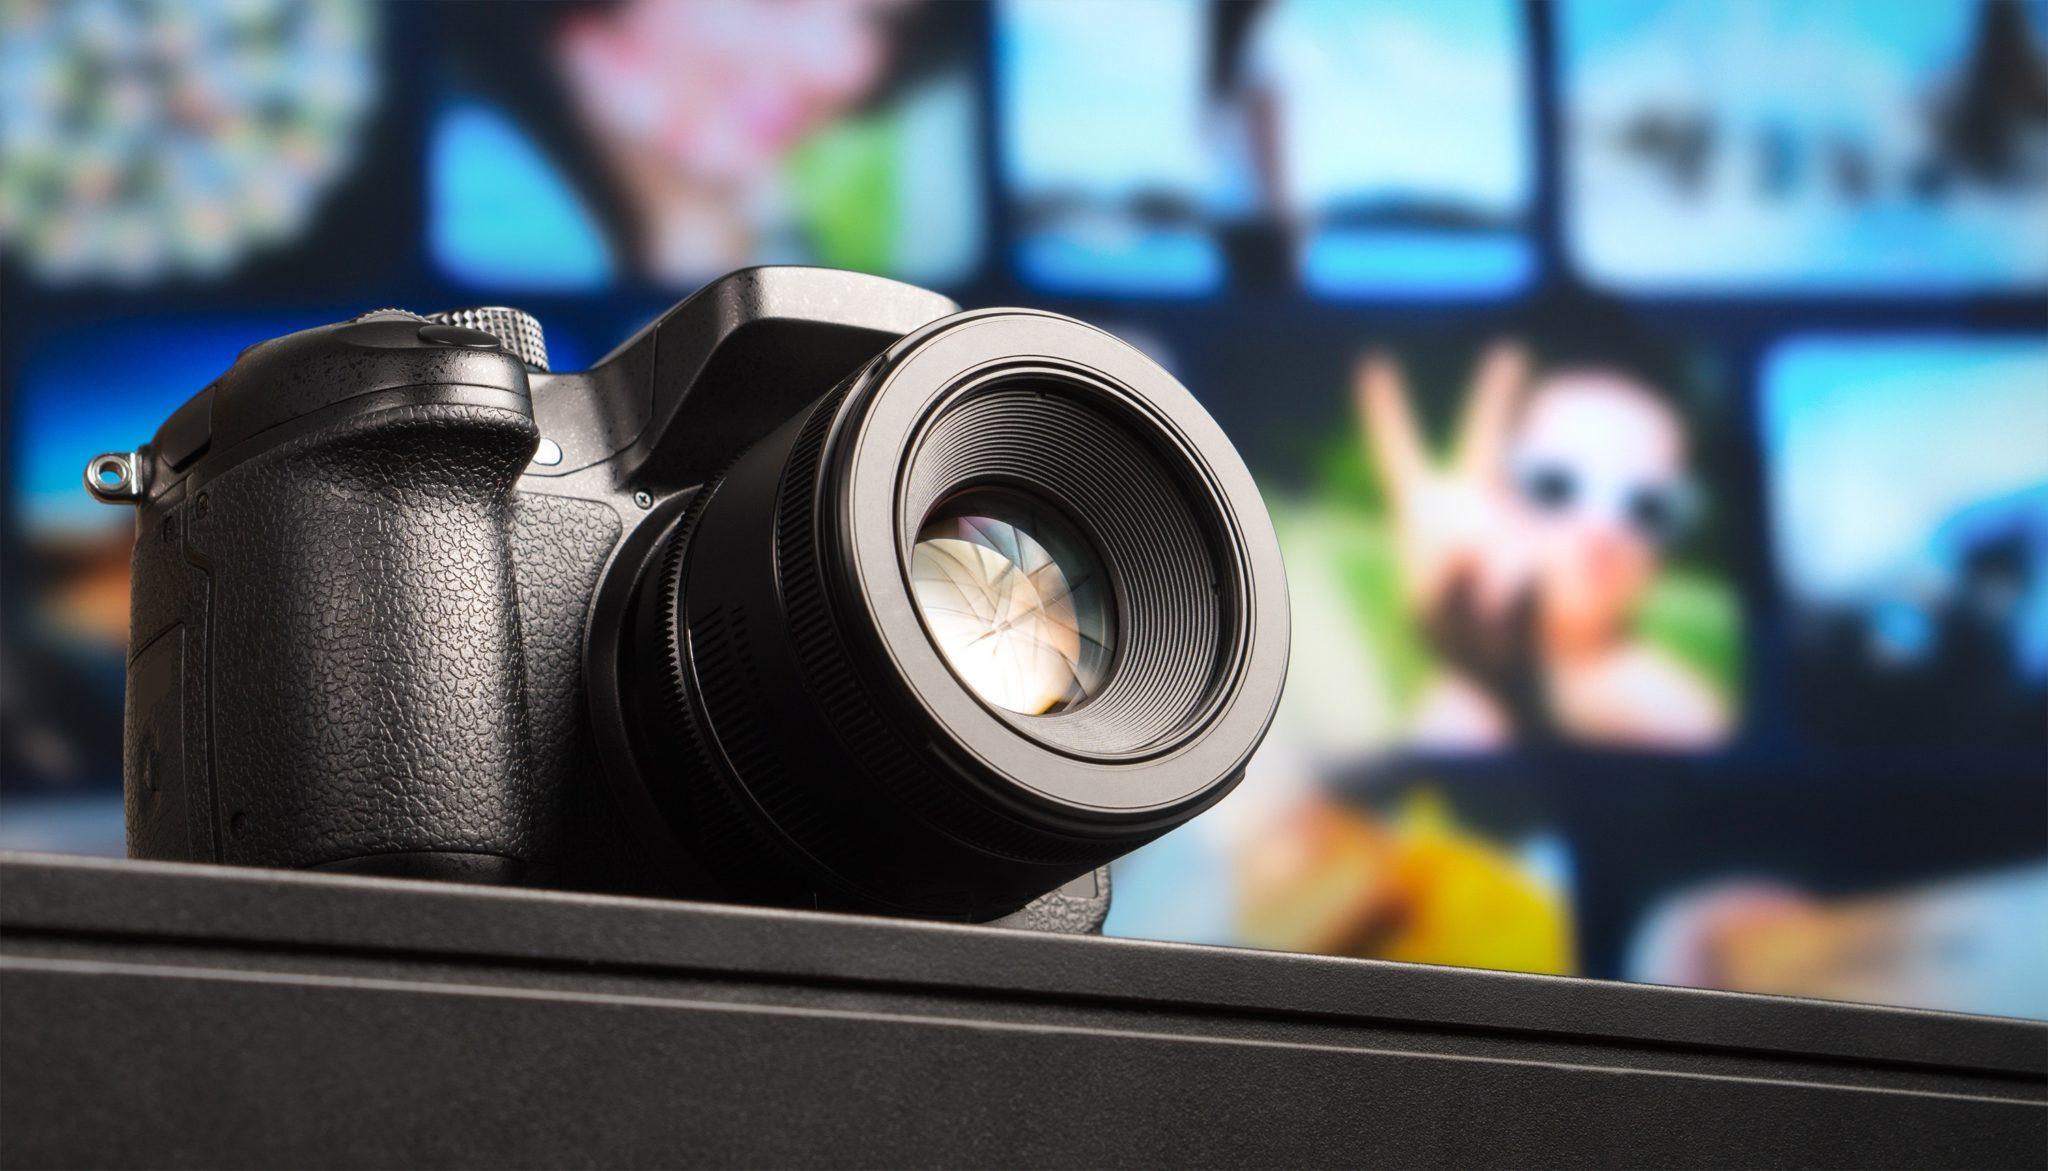 best cheap digital camera under $ 50